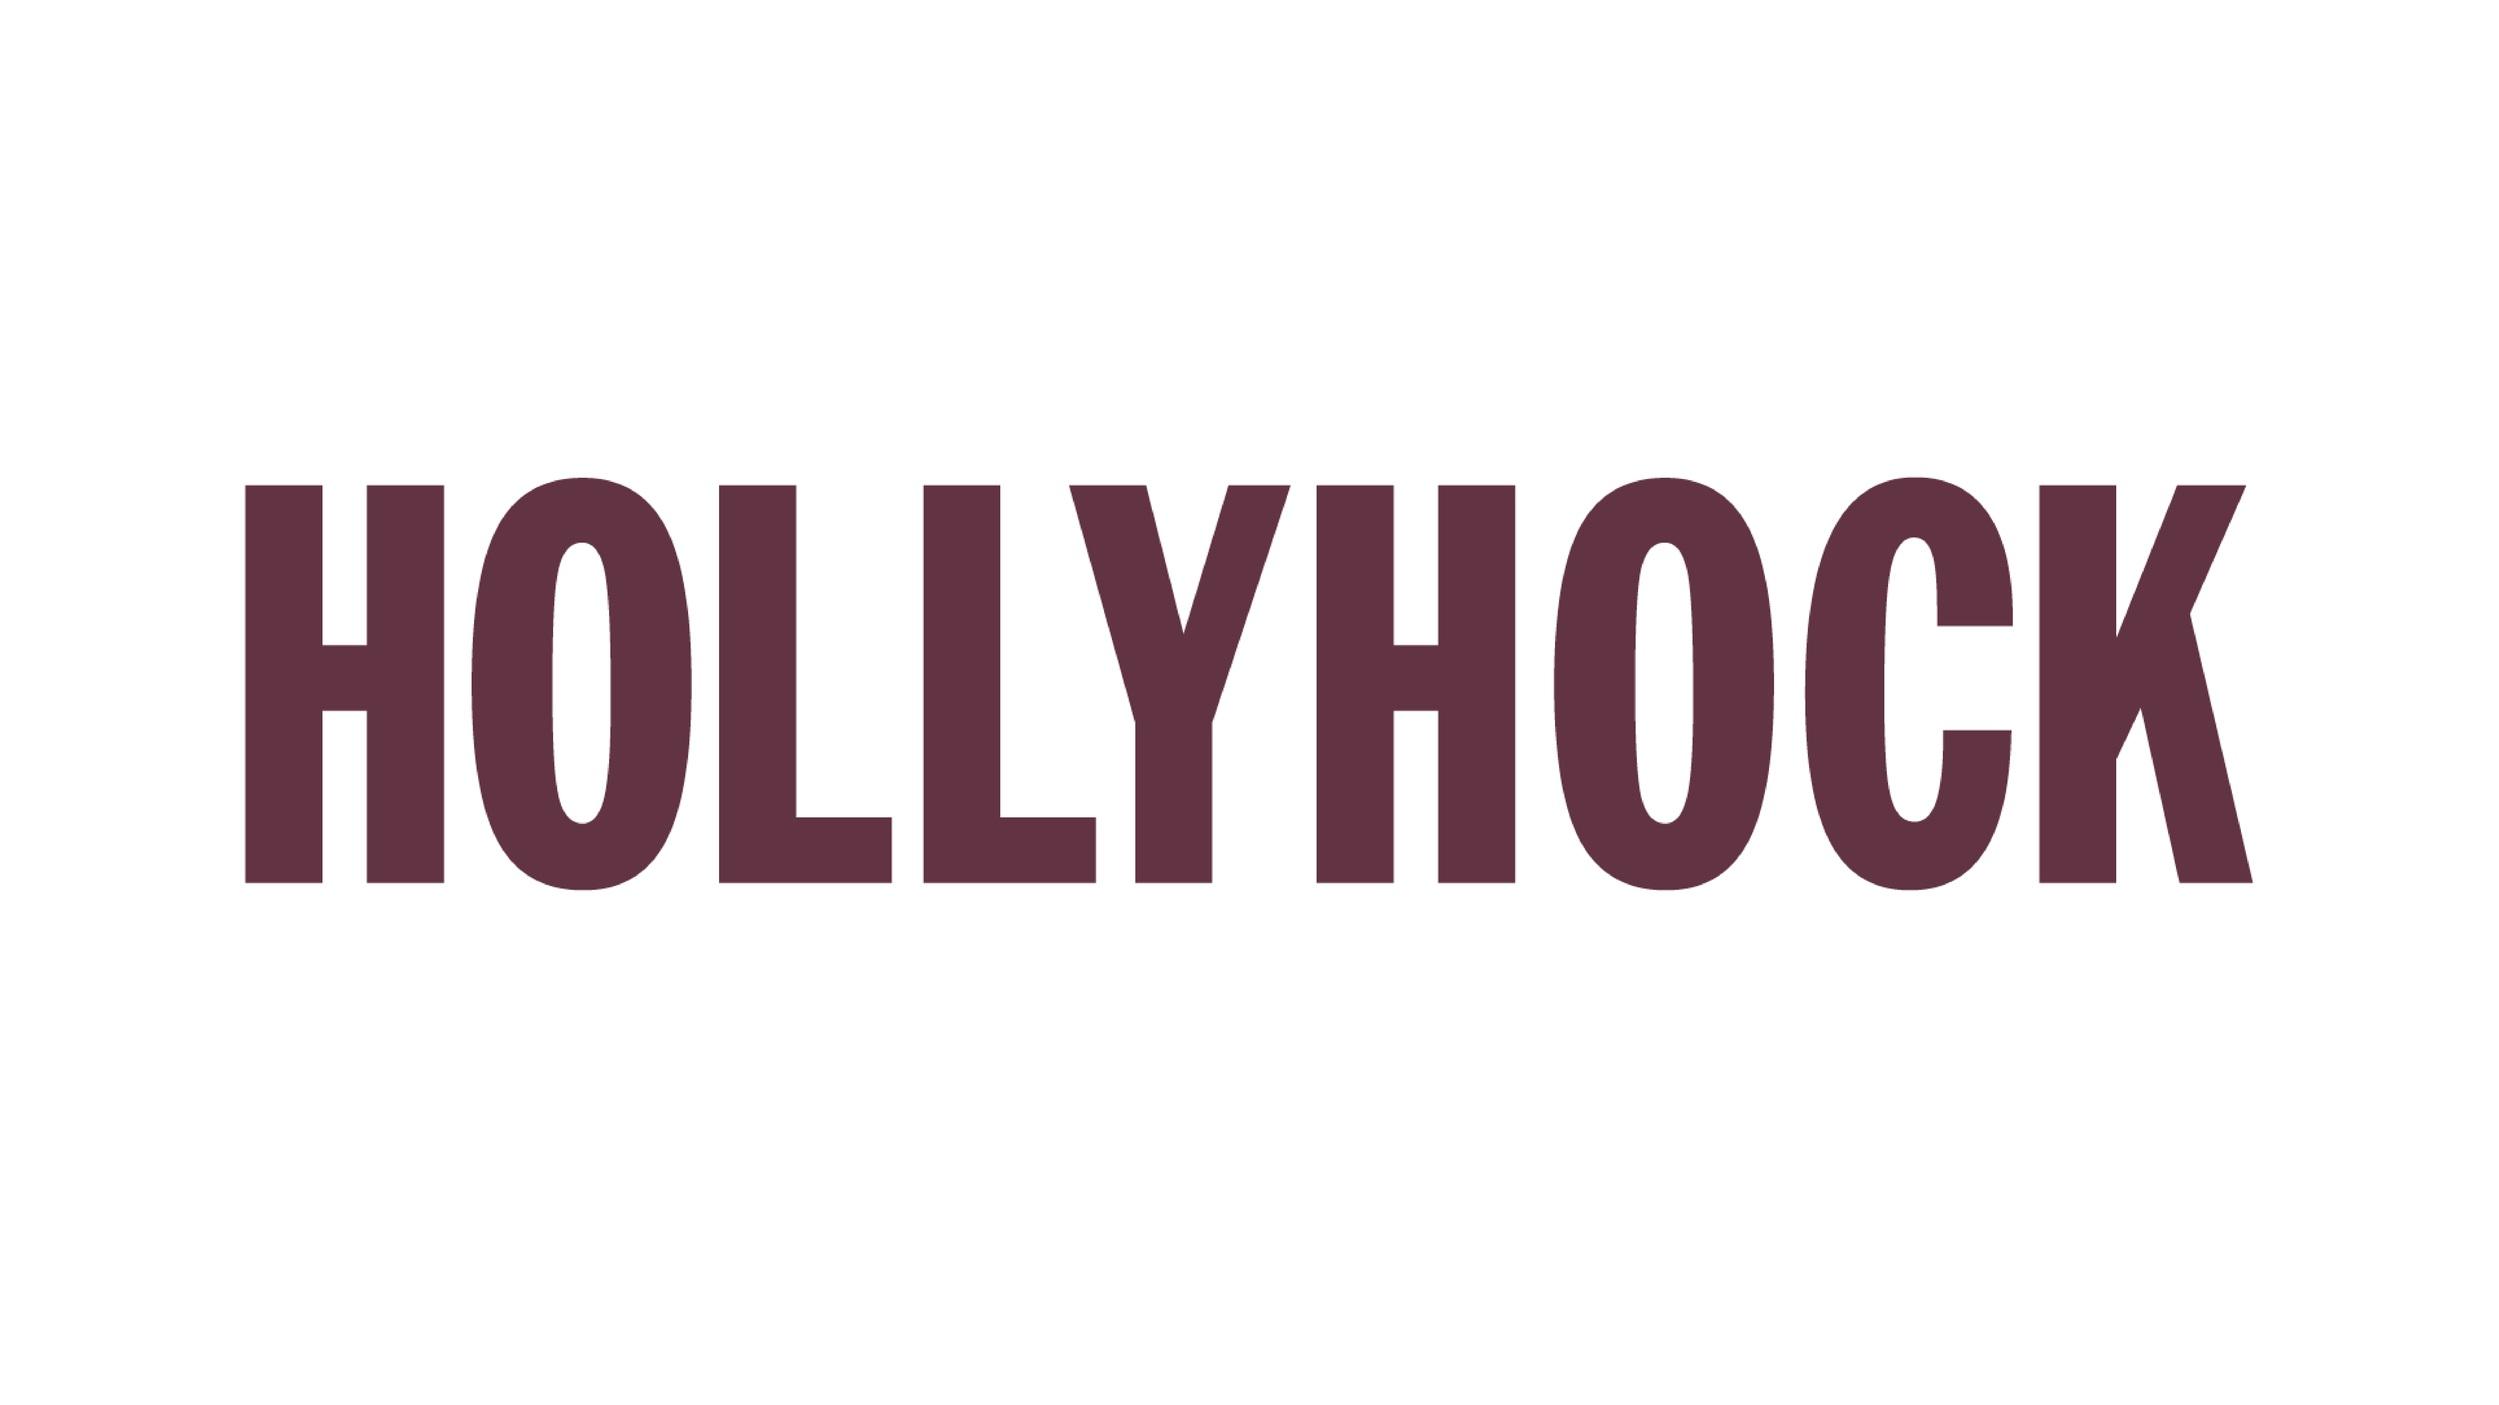 Hollyhock-01.jpg